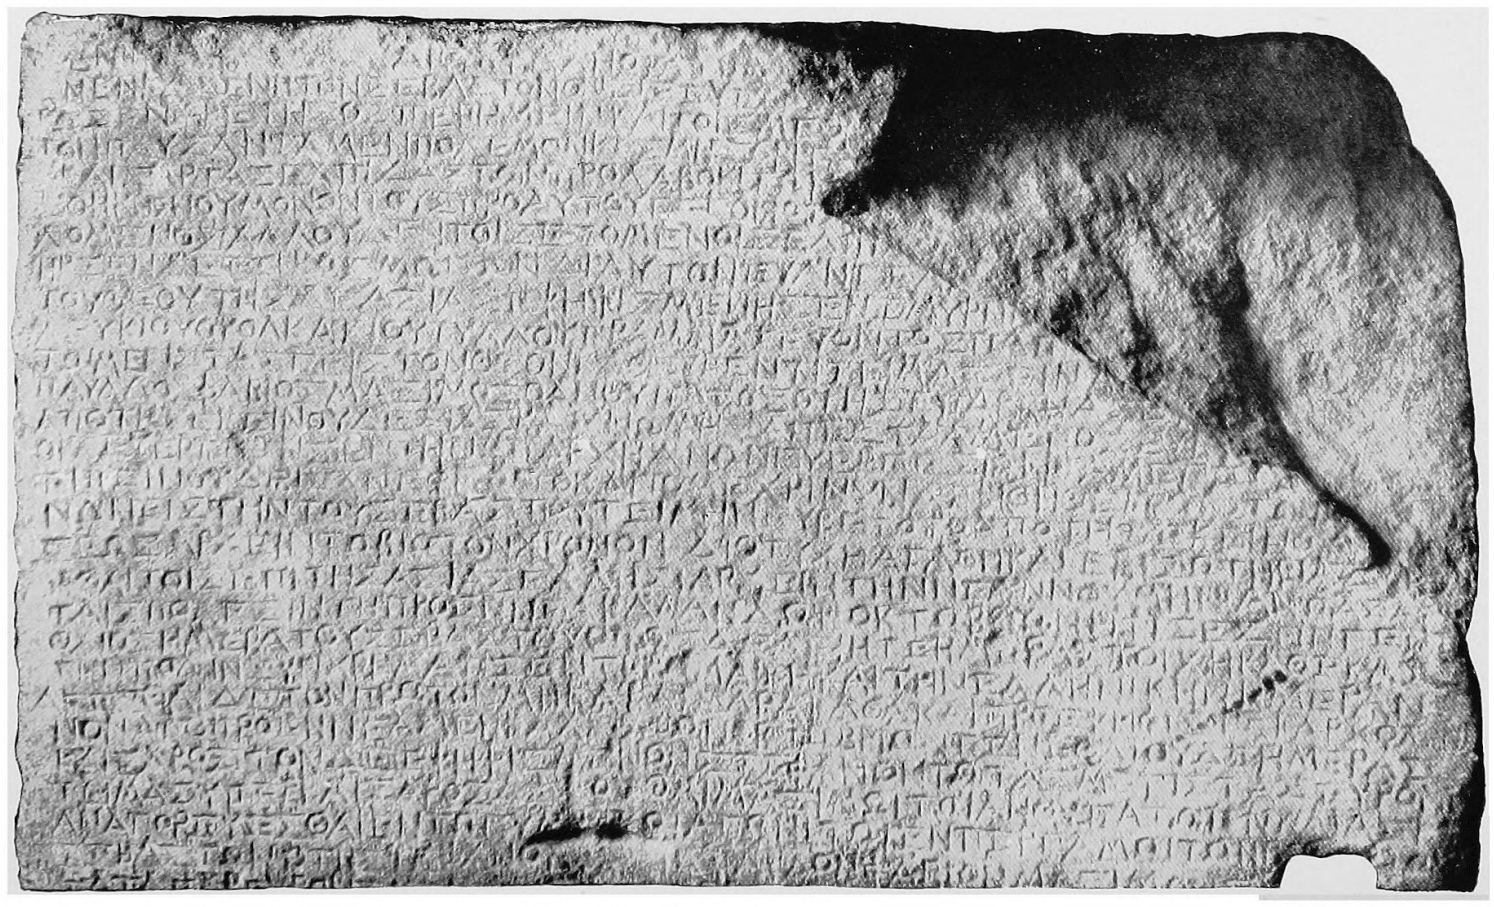 The Priene calendar inscription